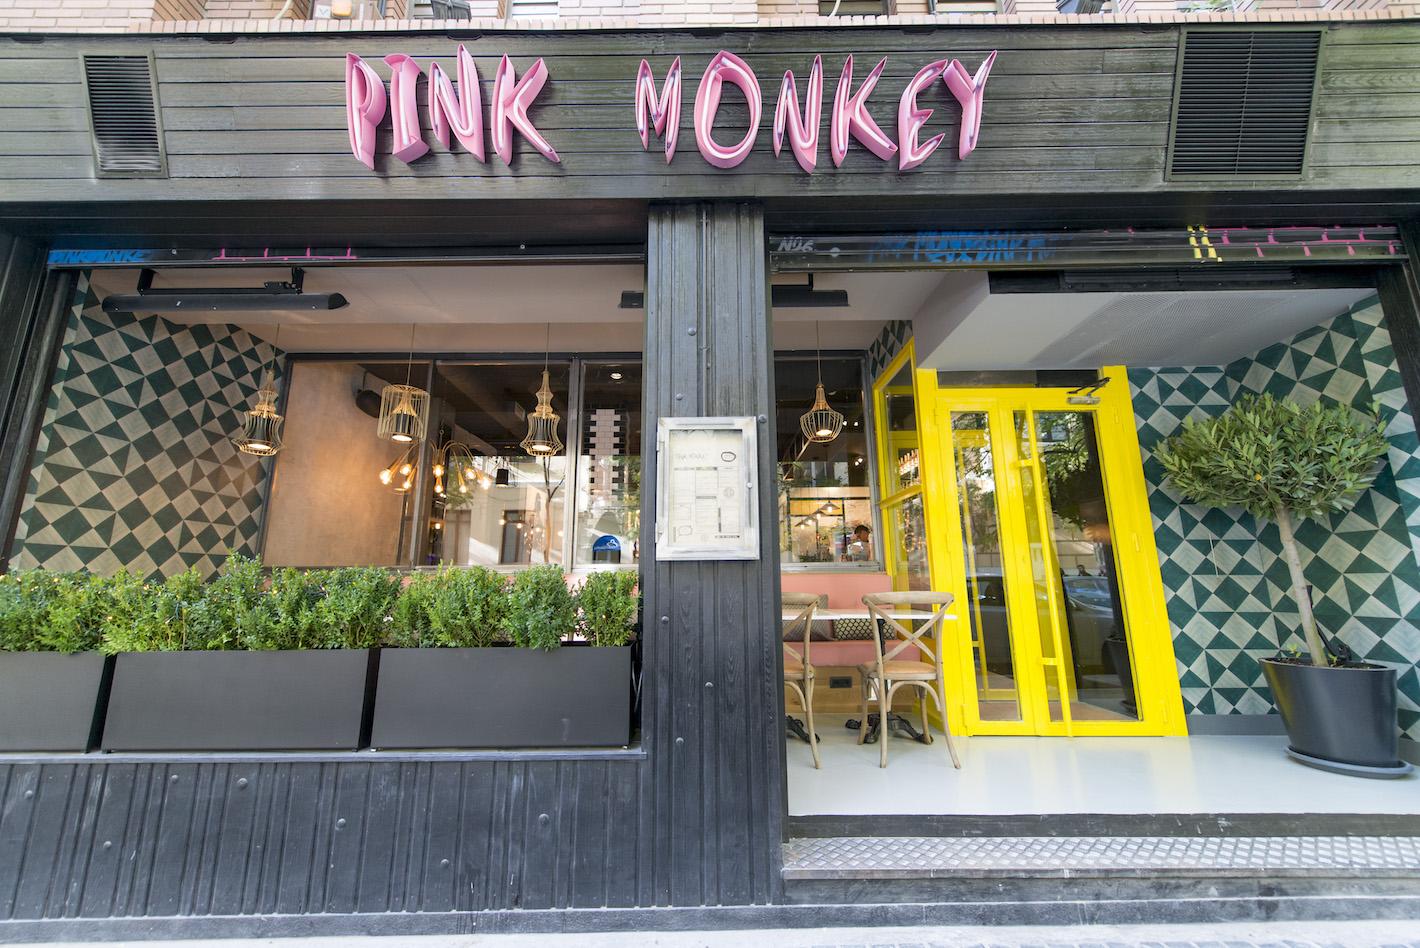 PINK MONKEY, UN ASIANA GAMBERRO E INFORMAL